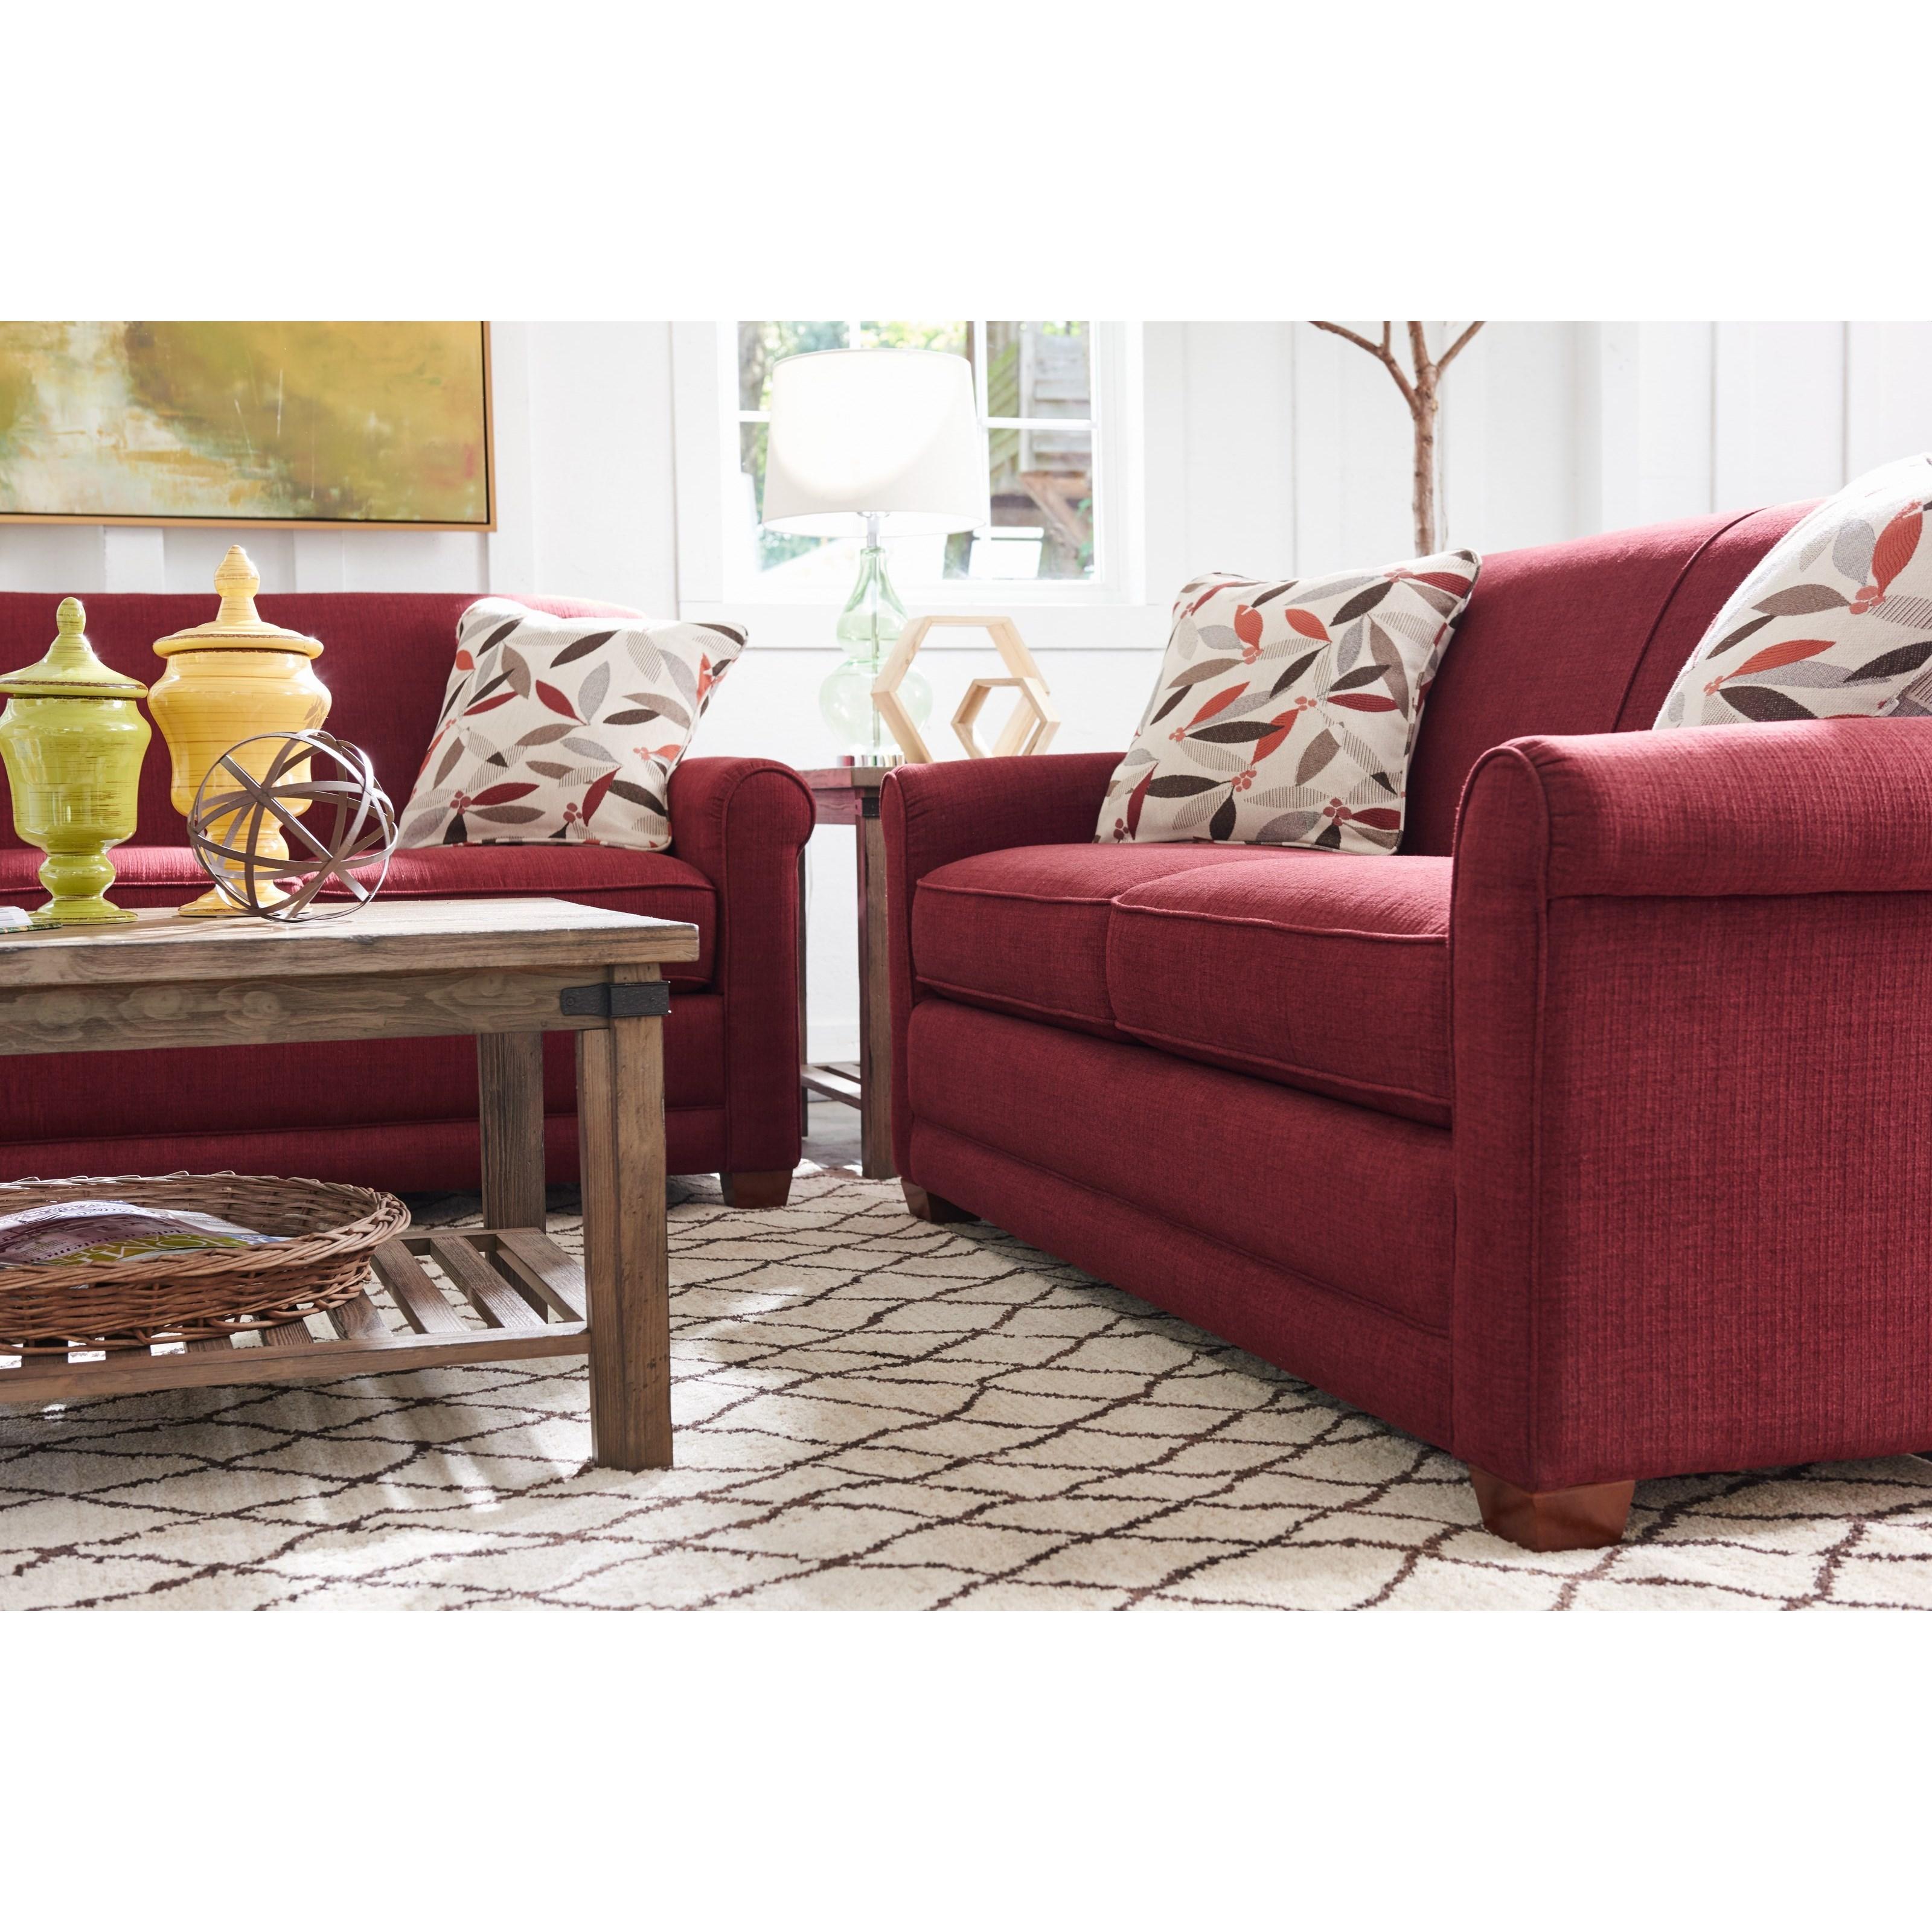 La z boy amanda casual apartment size sofa with premier for Apartment size sofa dimensions